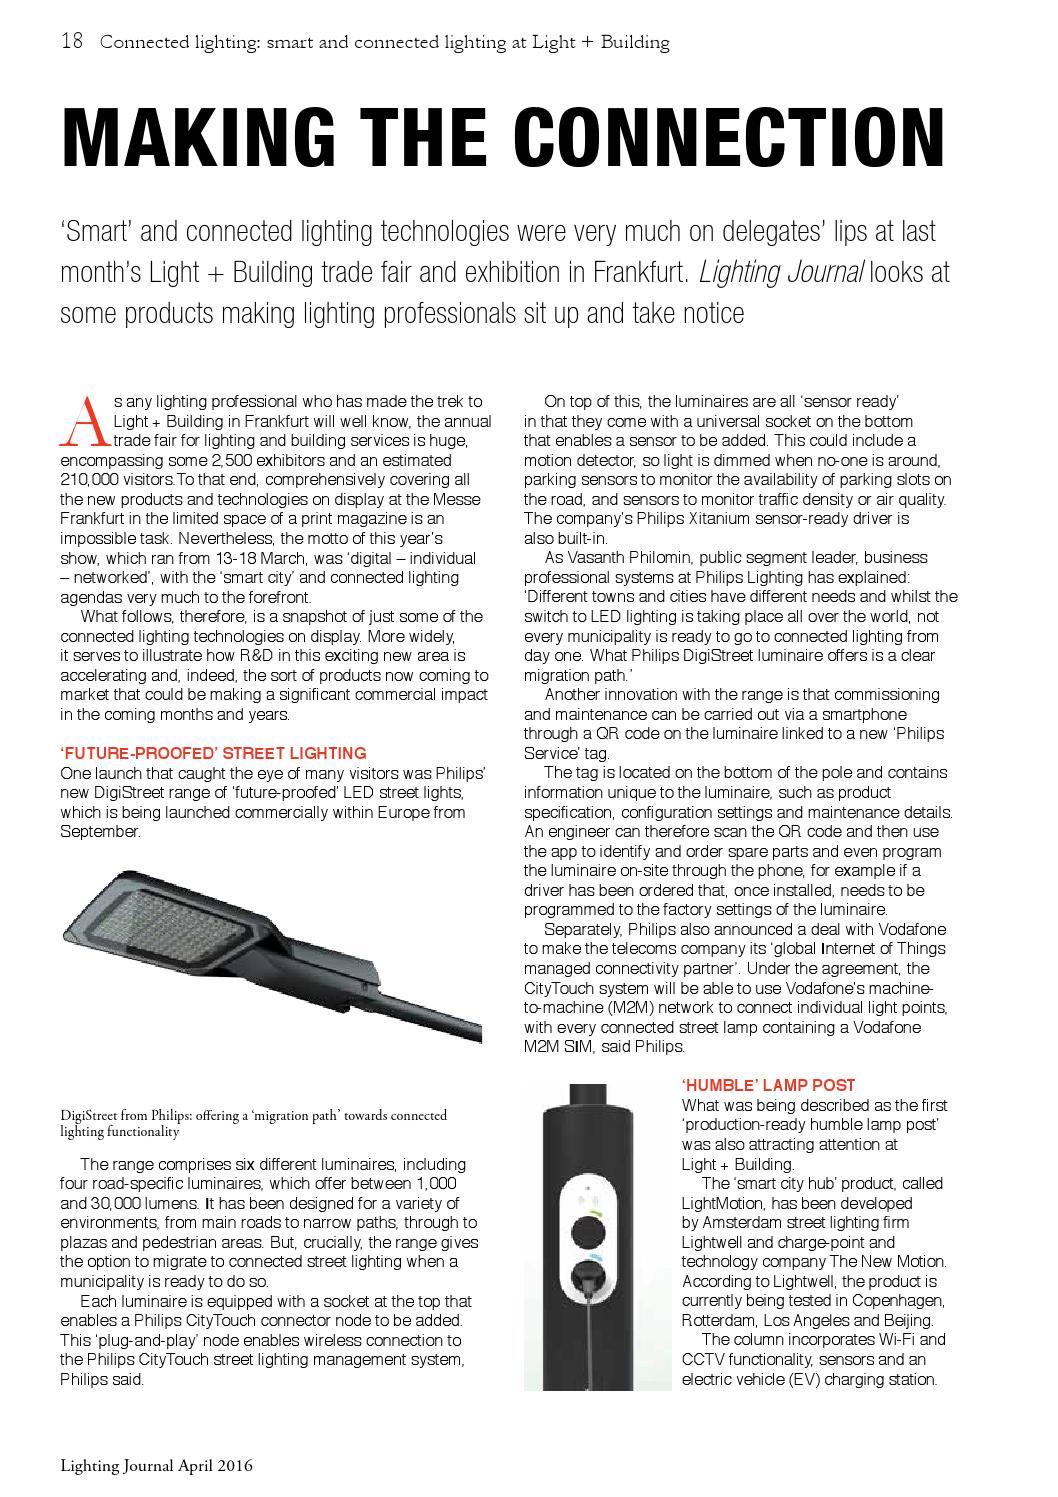 Lighting Journal April 2016 by Matrix Print Consultants Ltd